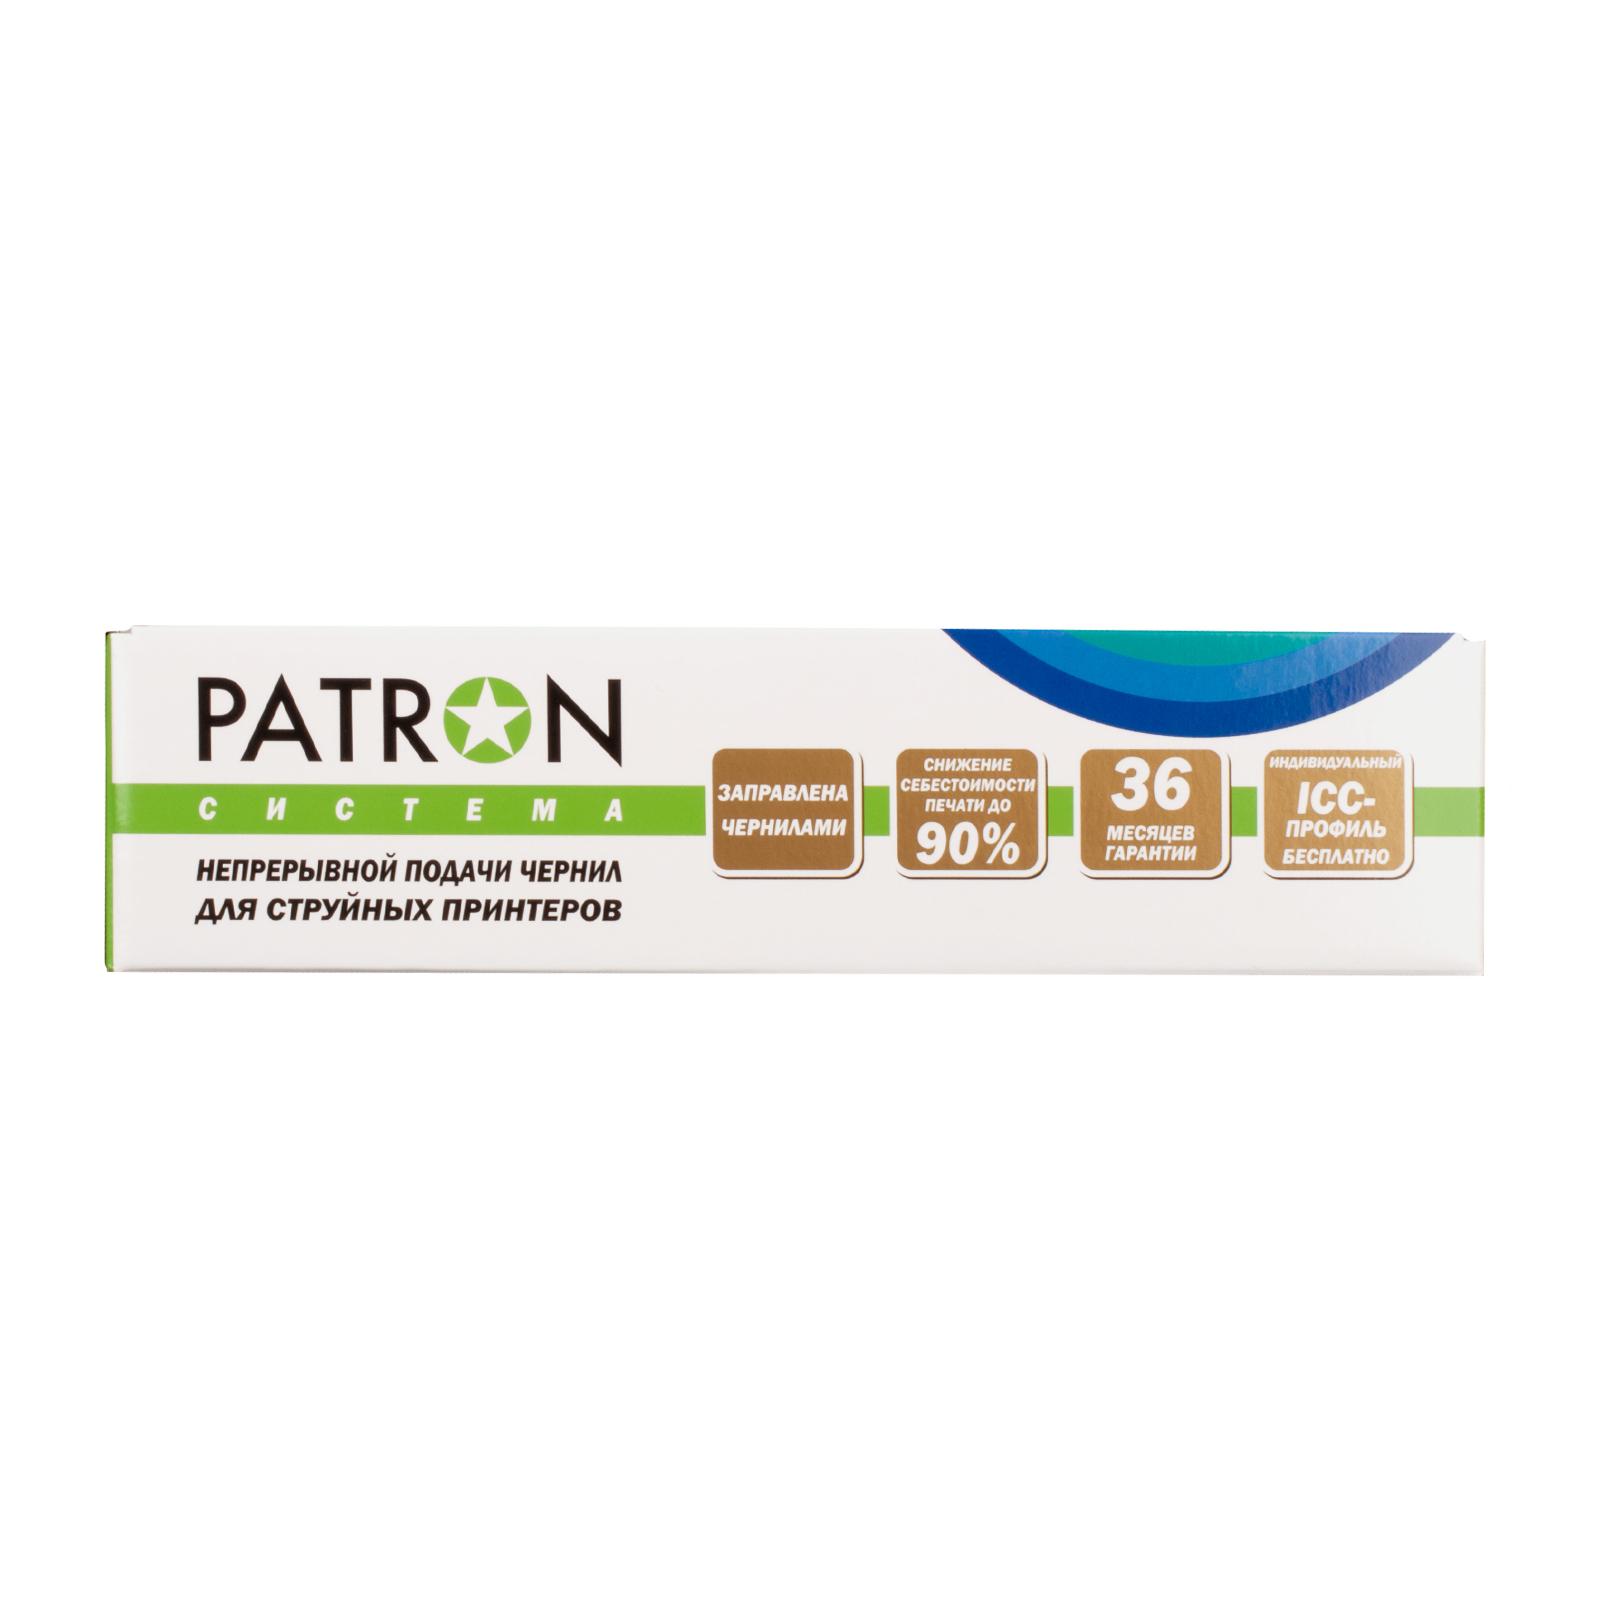 СНПЧ PATRON Epson XP-313/413/203/207/303/306/403/406 (CISS-PN-D-EPS-XP-313) изображение 4